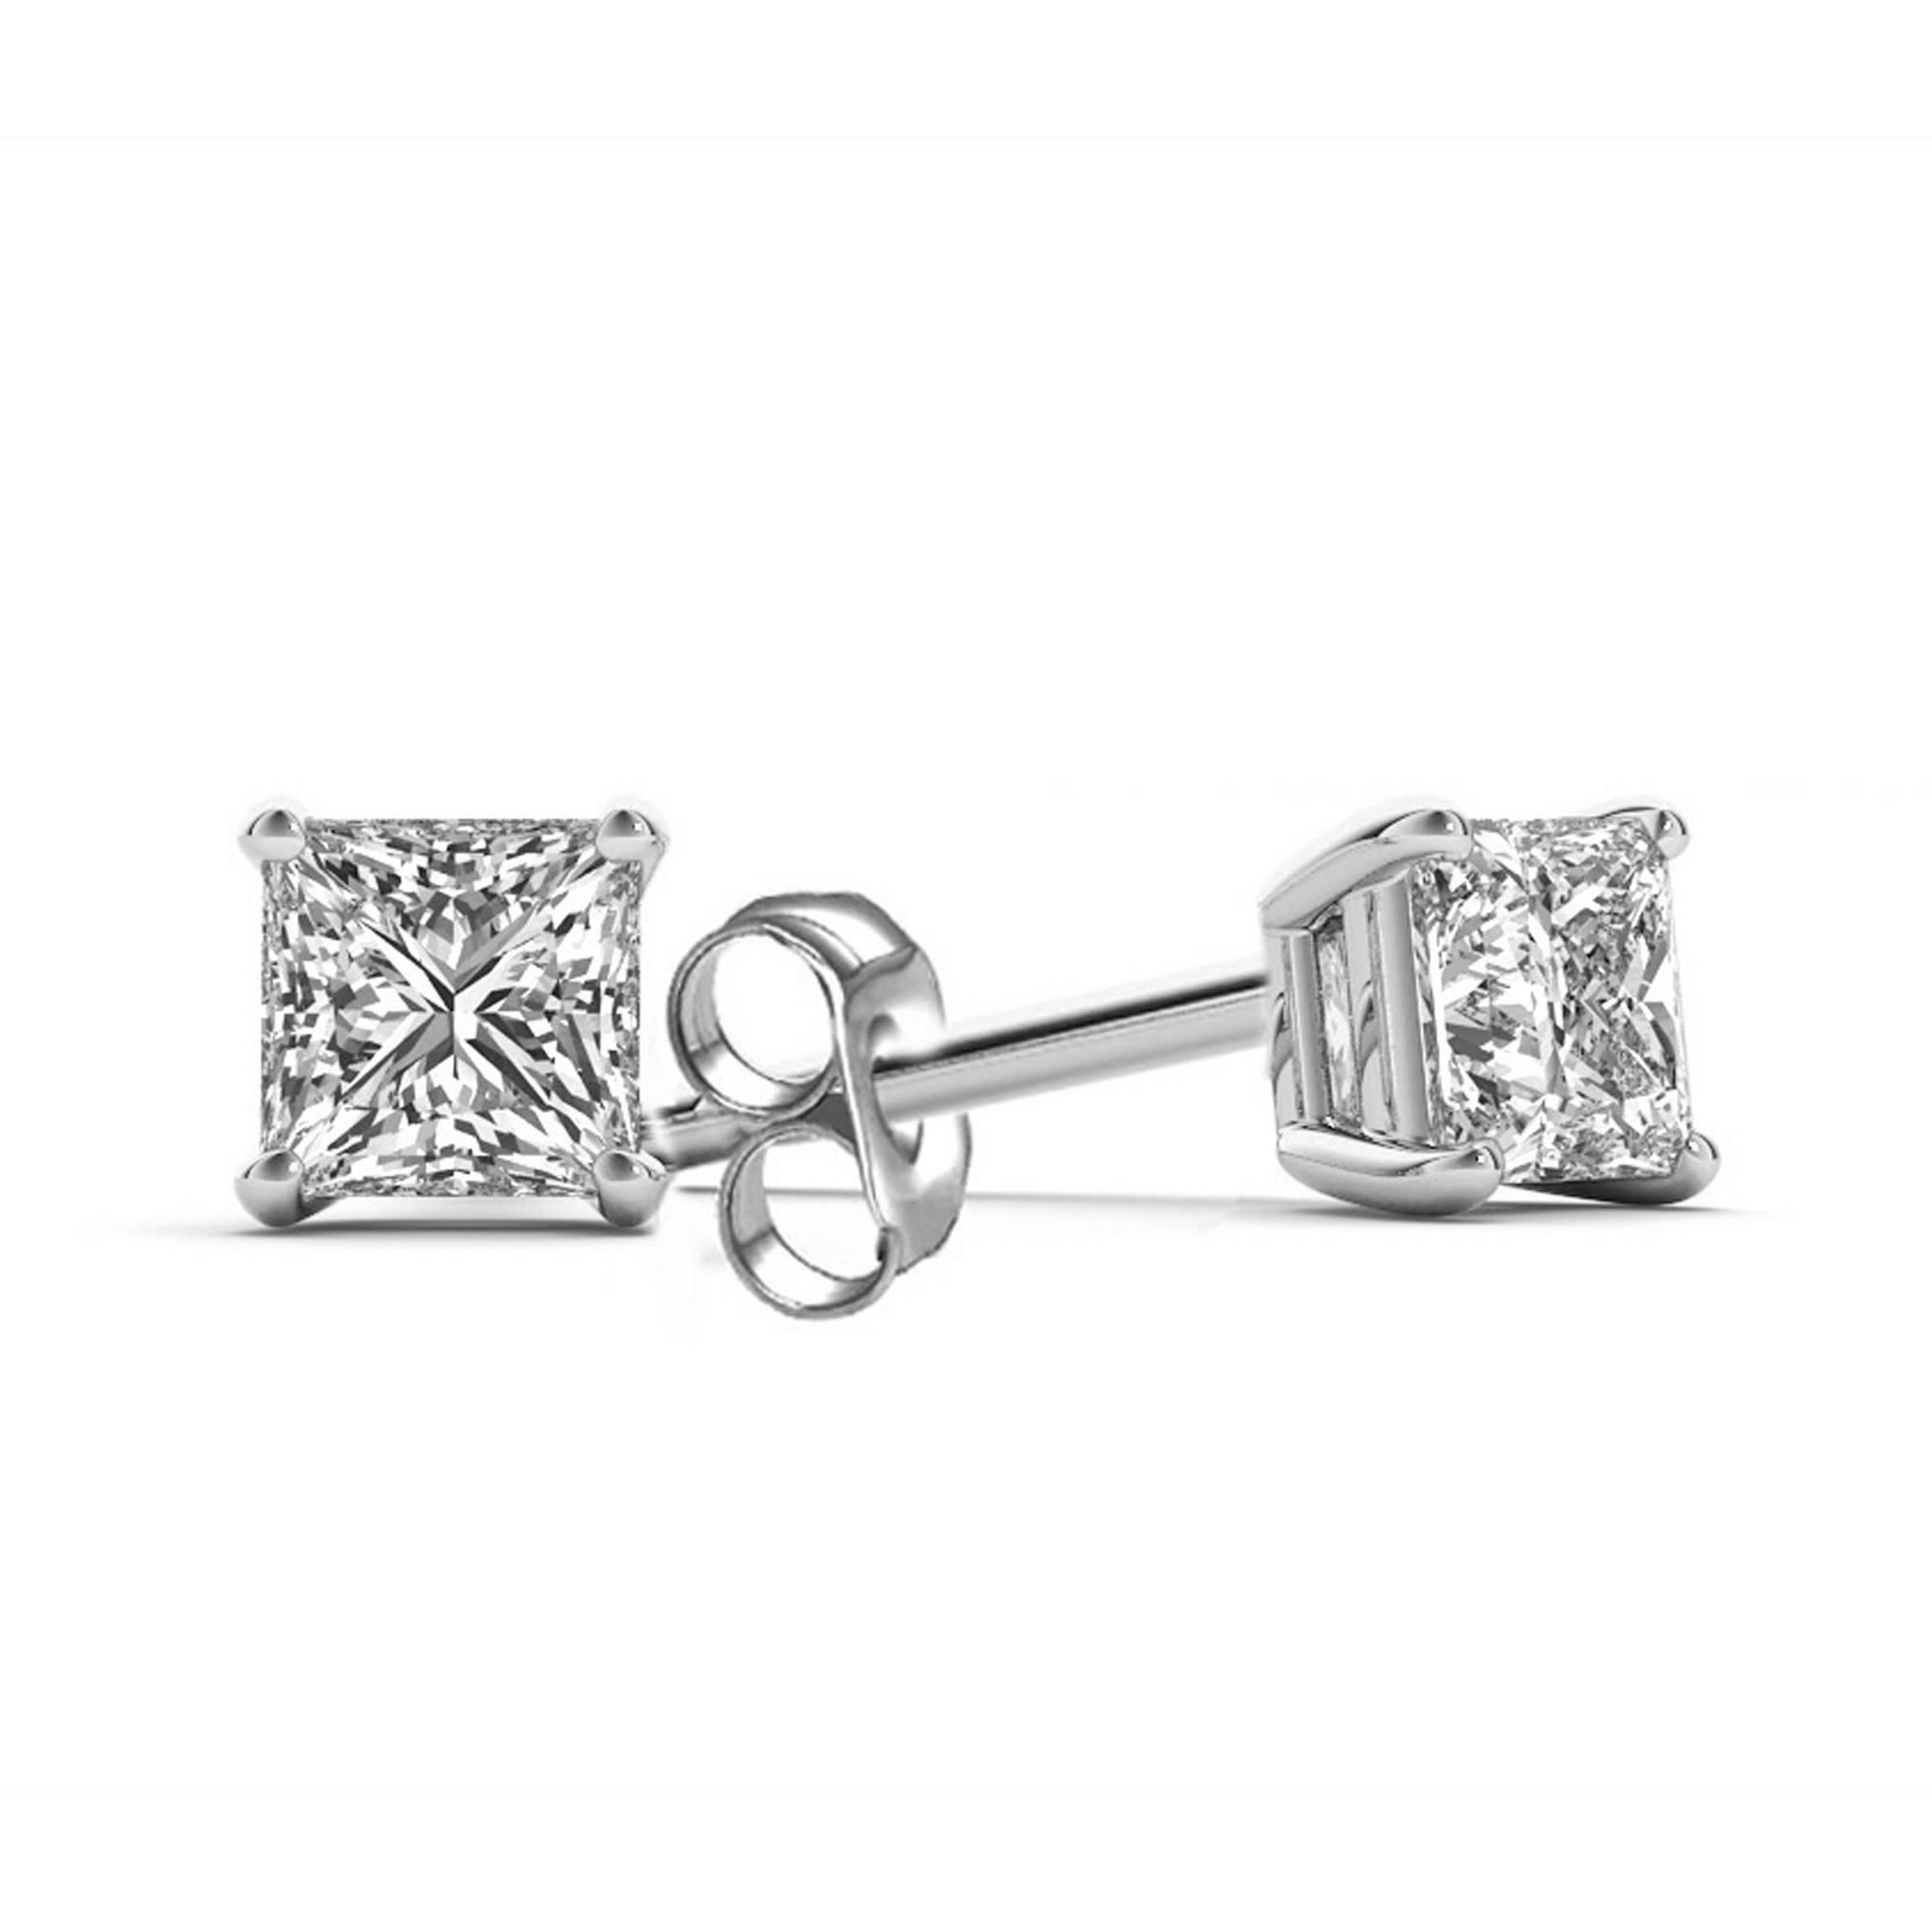 1 Carat T.W. Princess-Cut Diamond 14kt White Gold Stud Earrings